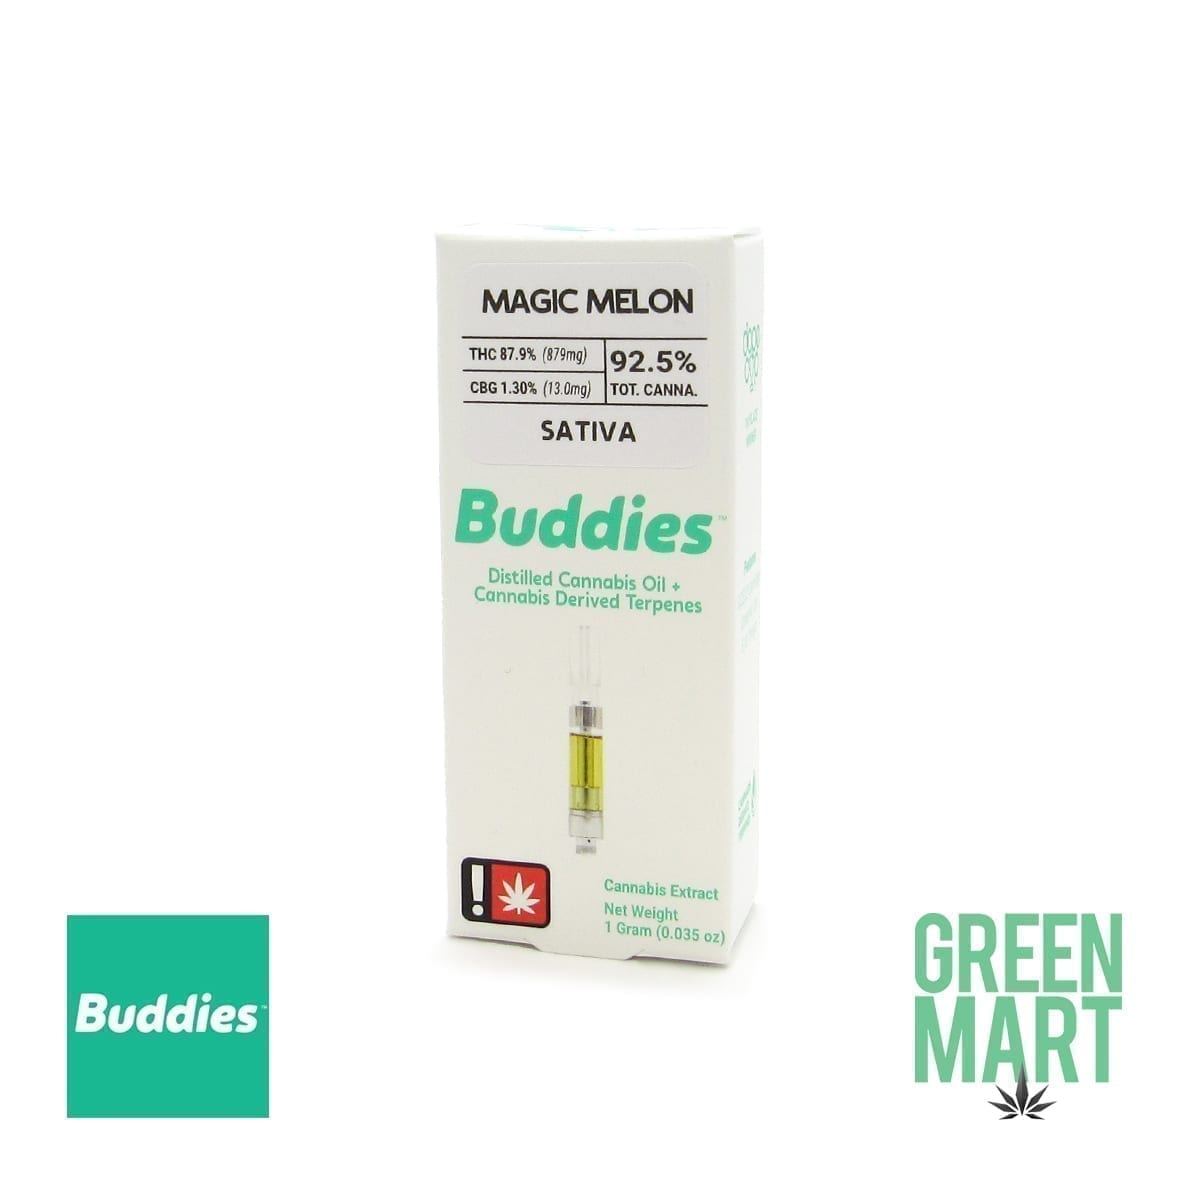 Buddies Brand Distillate Cartridge - Magic Melon